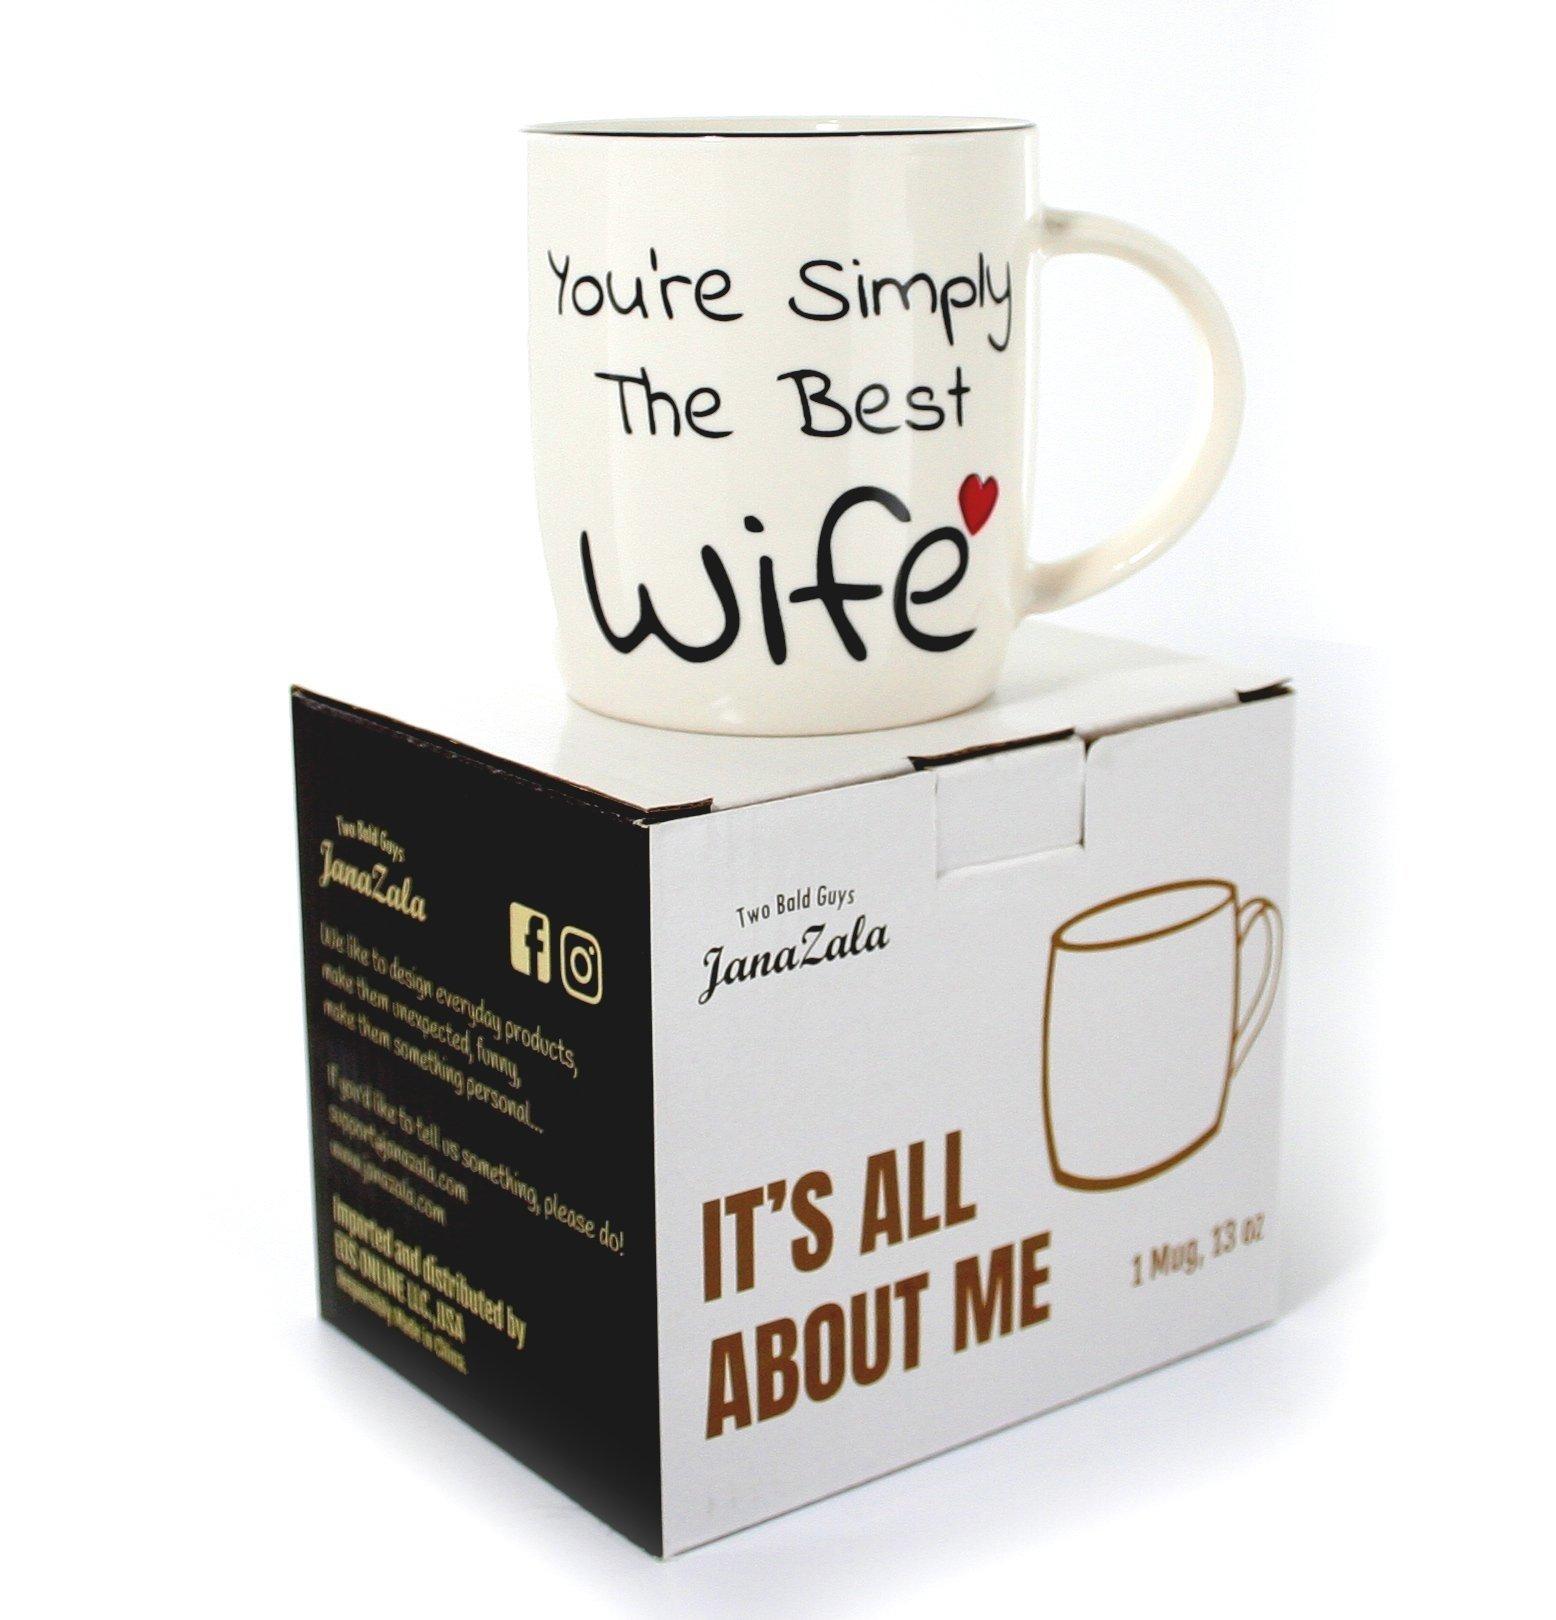 10 Perfect Birthday Gift Ideas For Wife janazala best wife mug youre simply the best wife mug coffee mug 2020